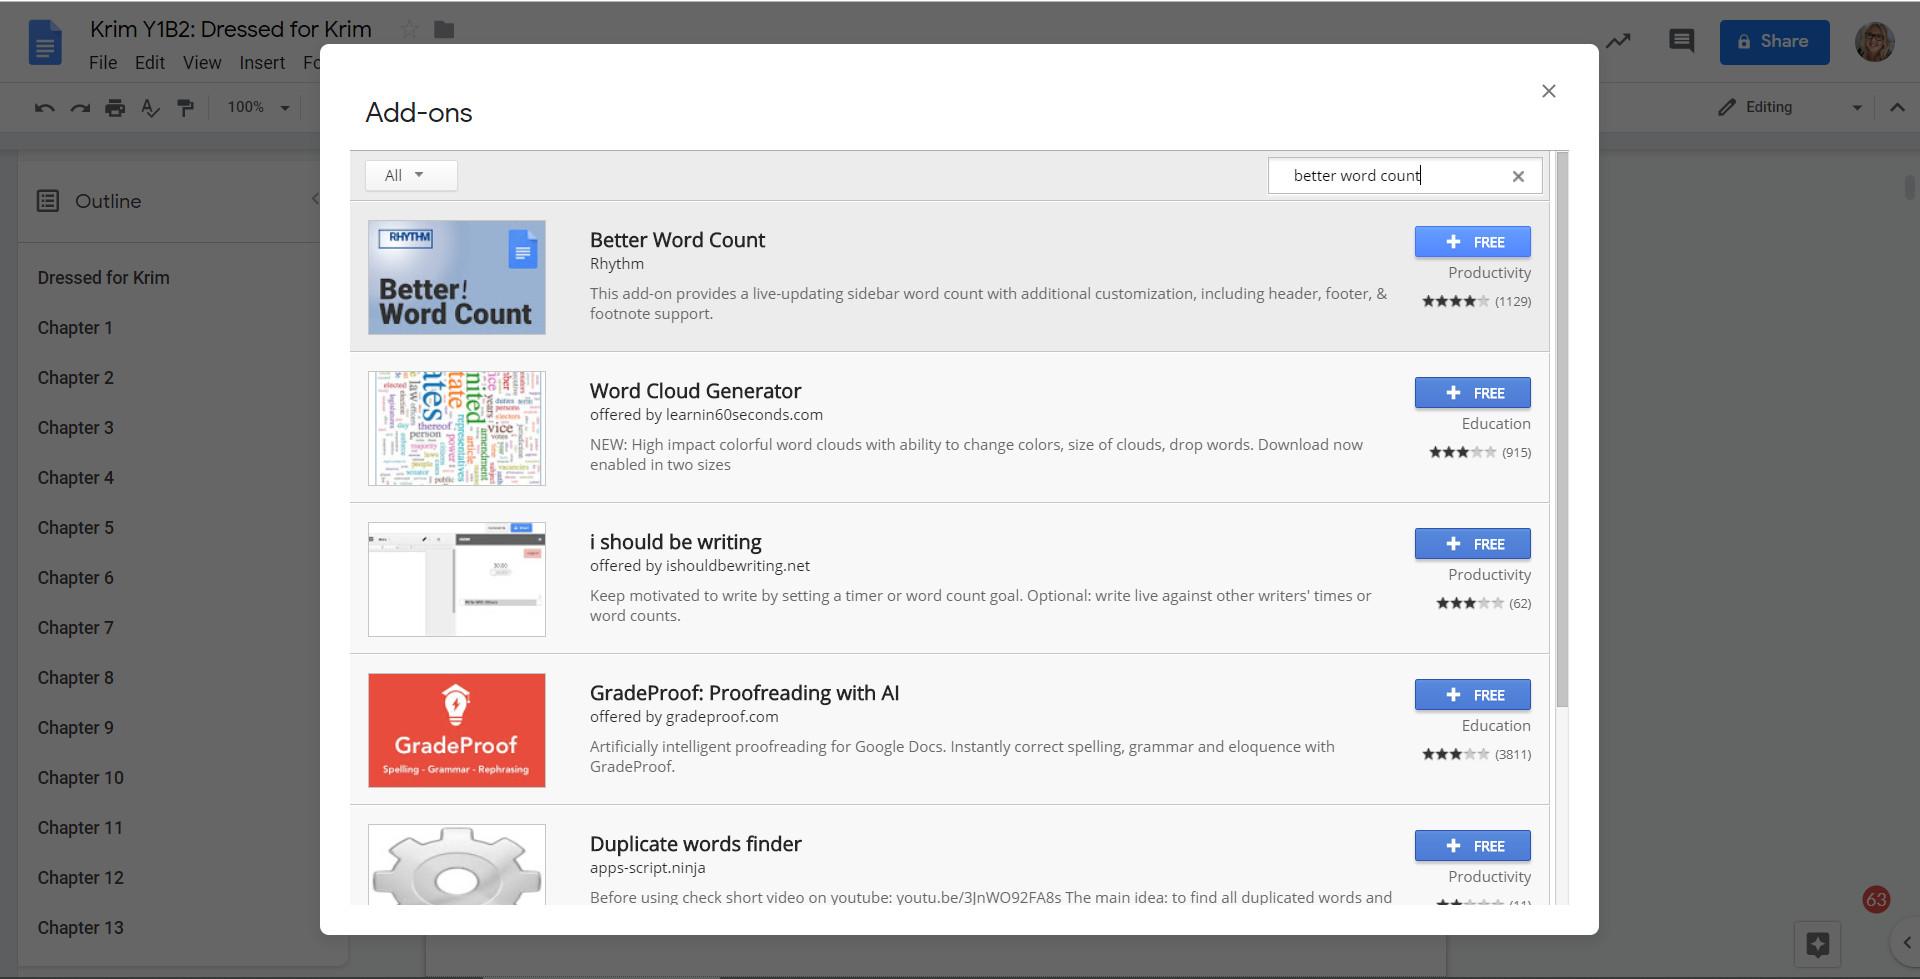 14 Reasons to Use Google Docs to Write